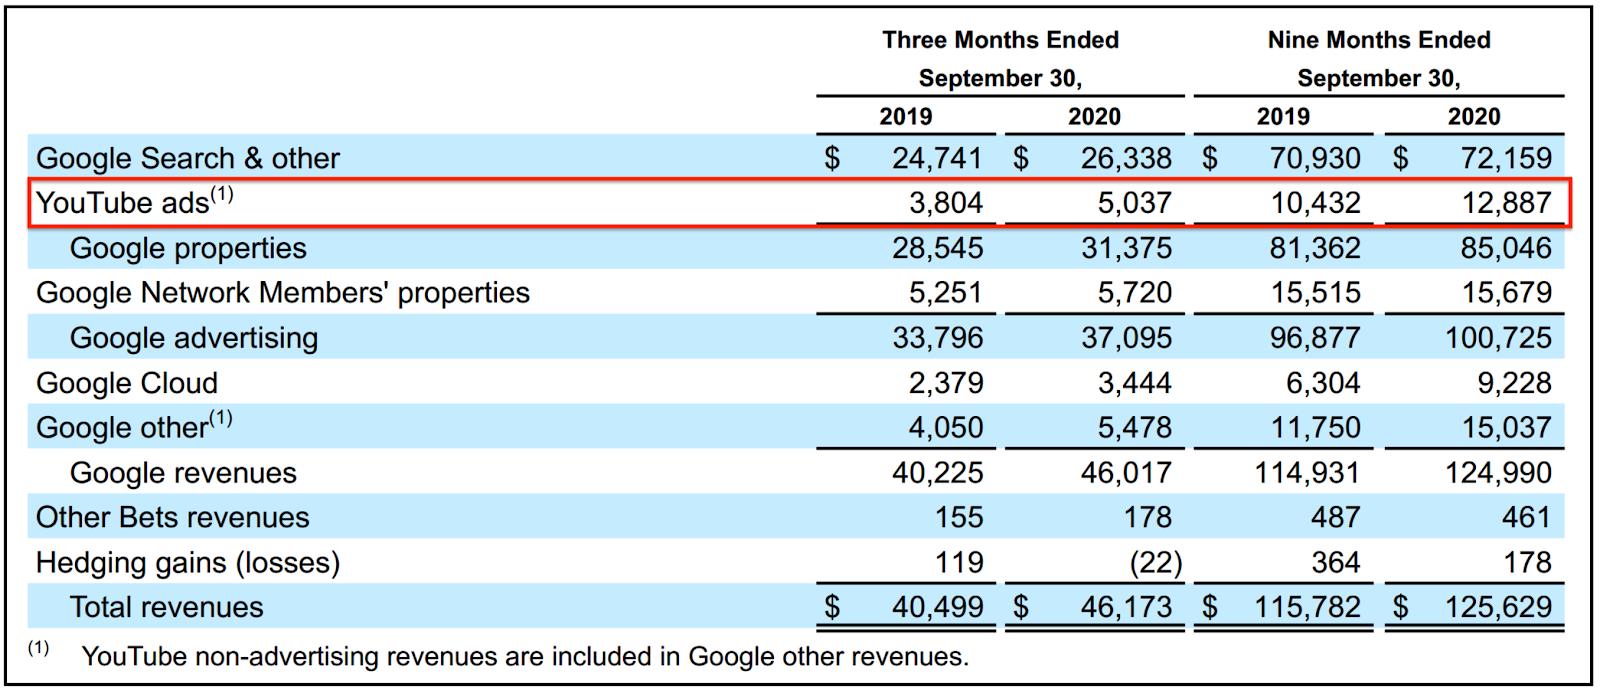 Alphabet revenue by business segment; YouTube revenue is nearly $20 billion per year